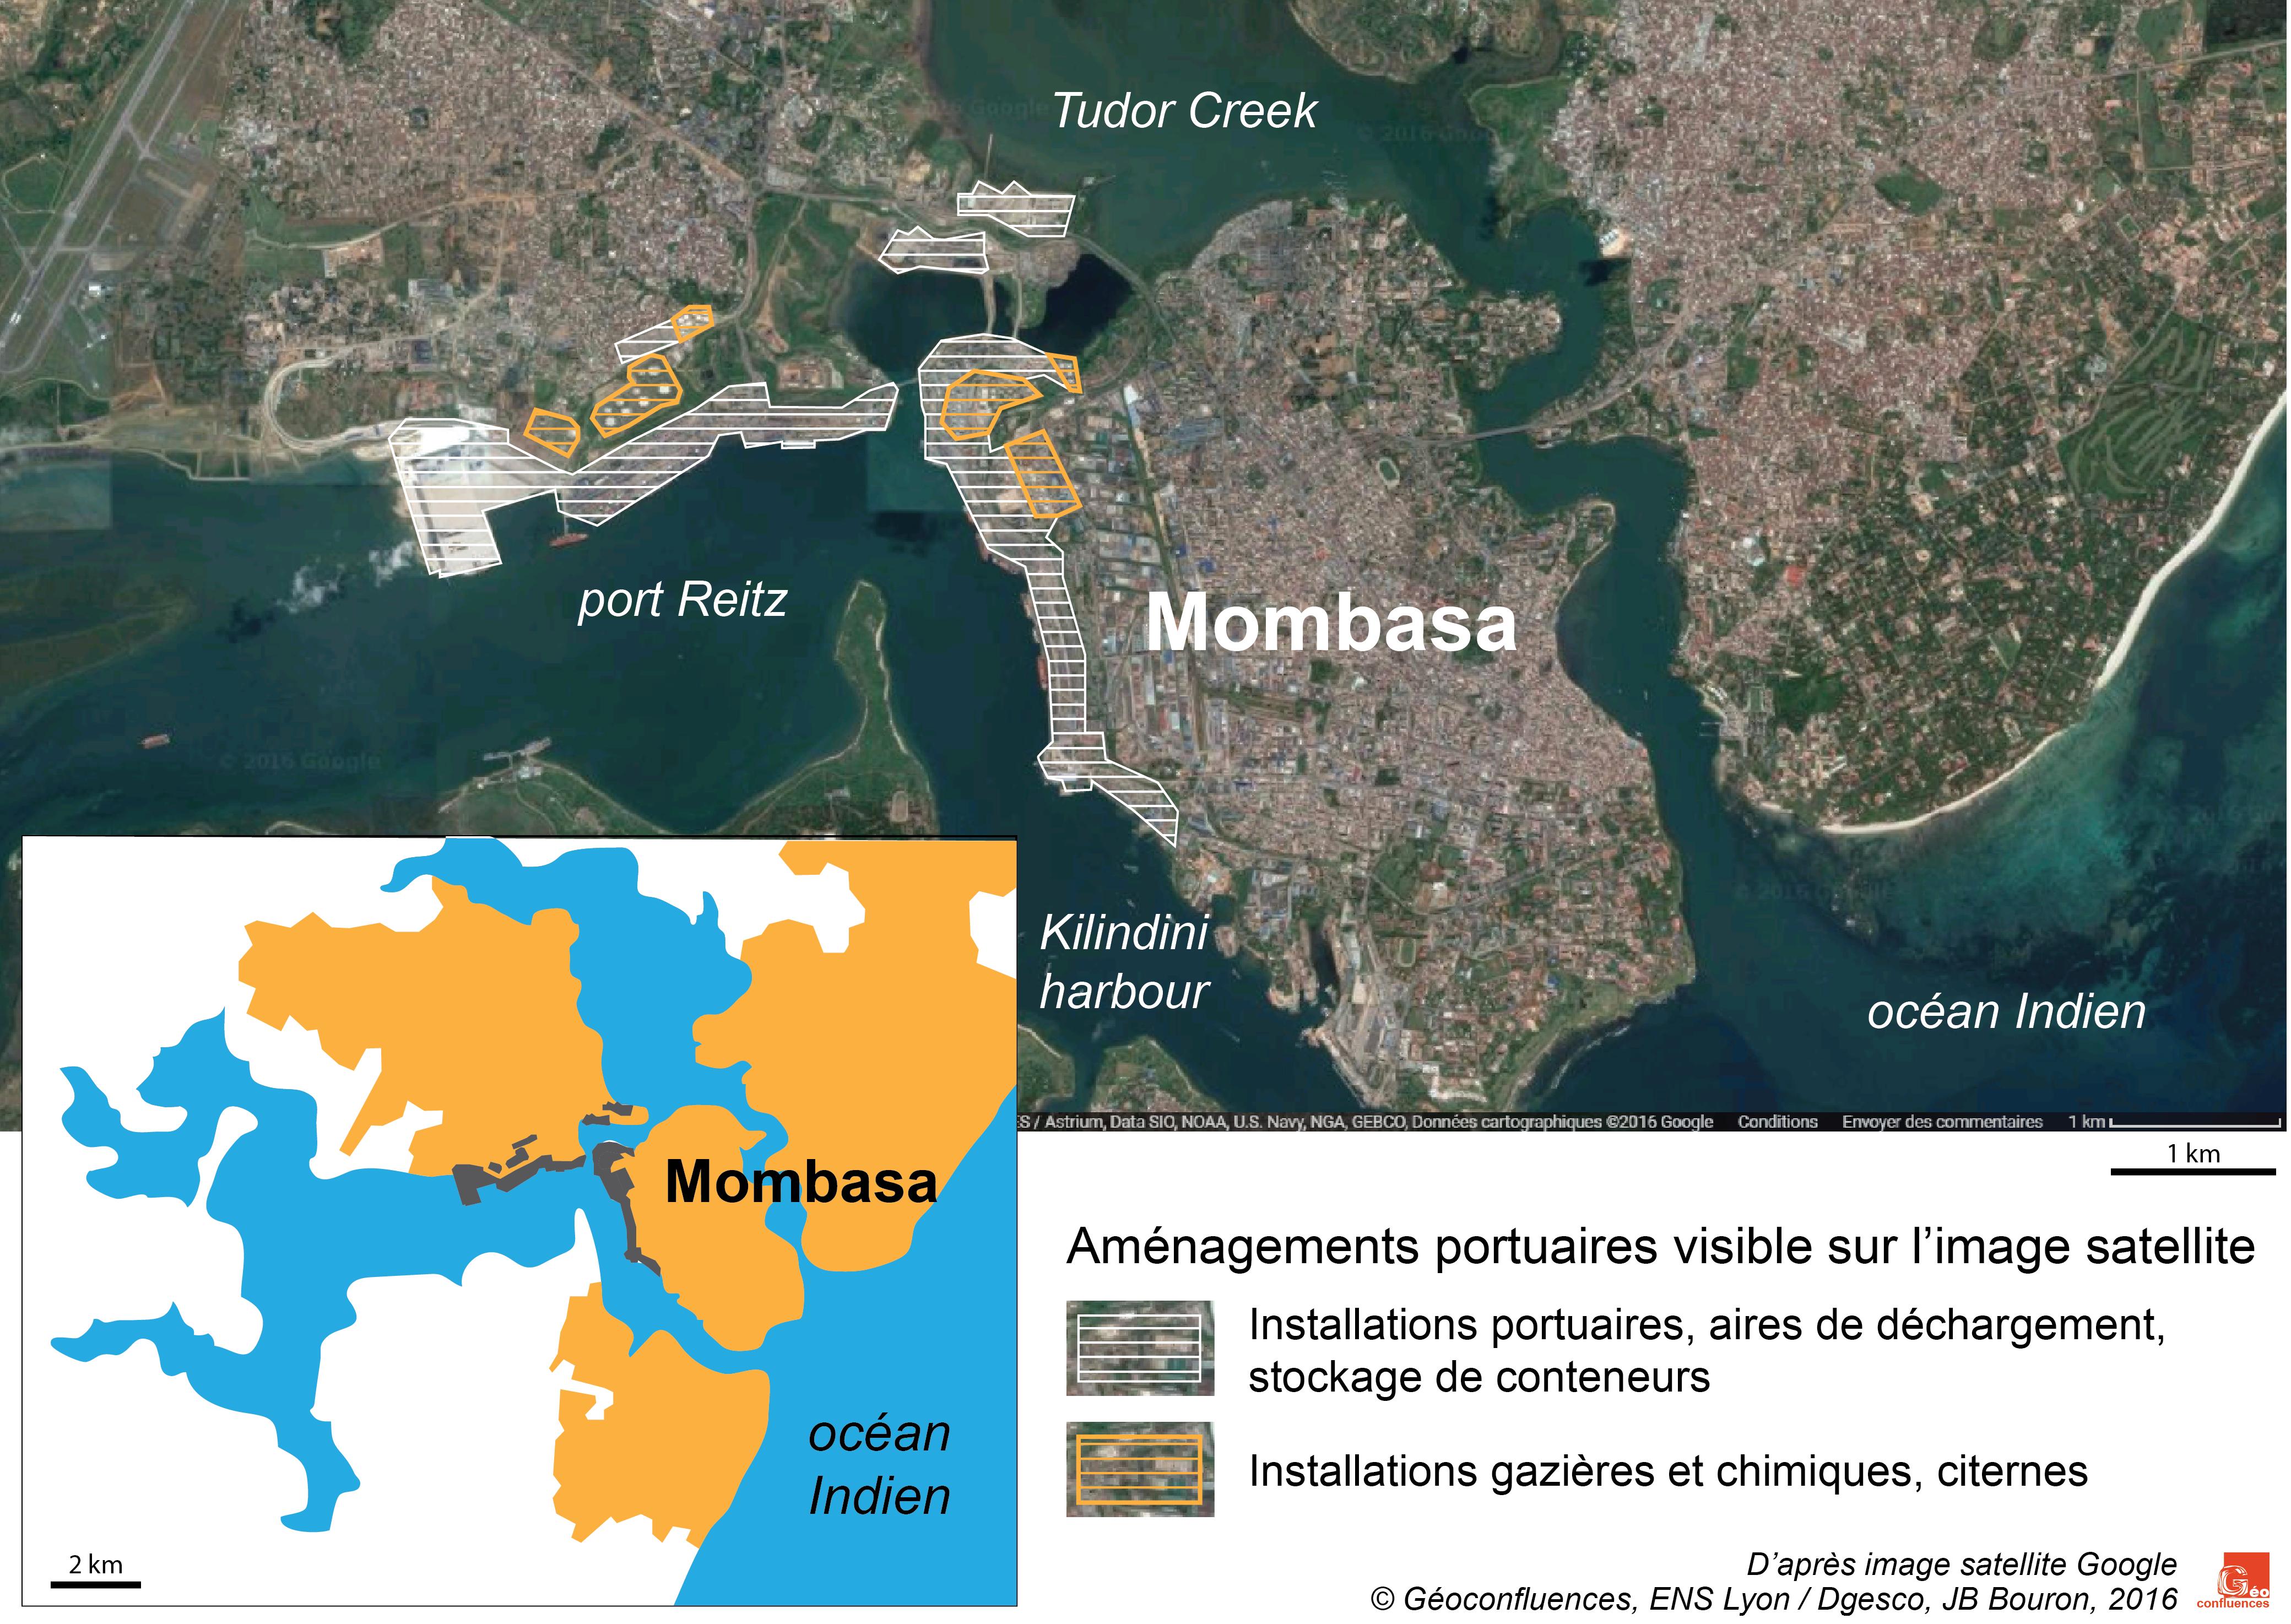 Plan de Mombasa et image satellite